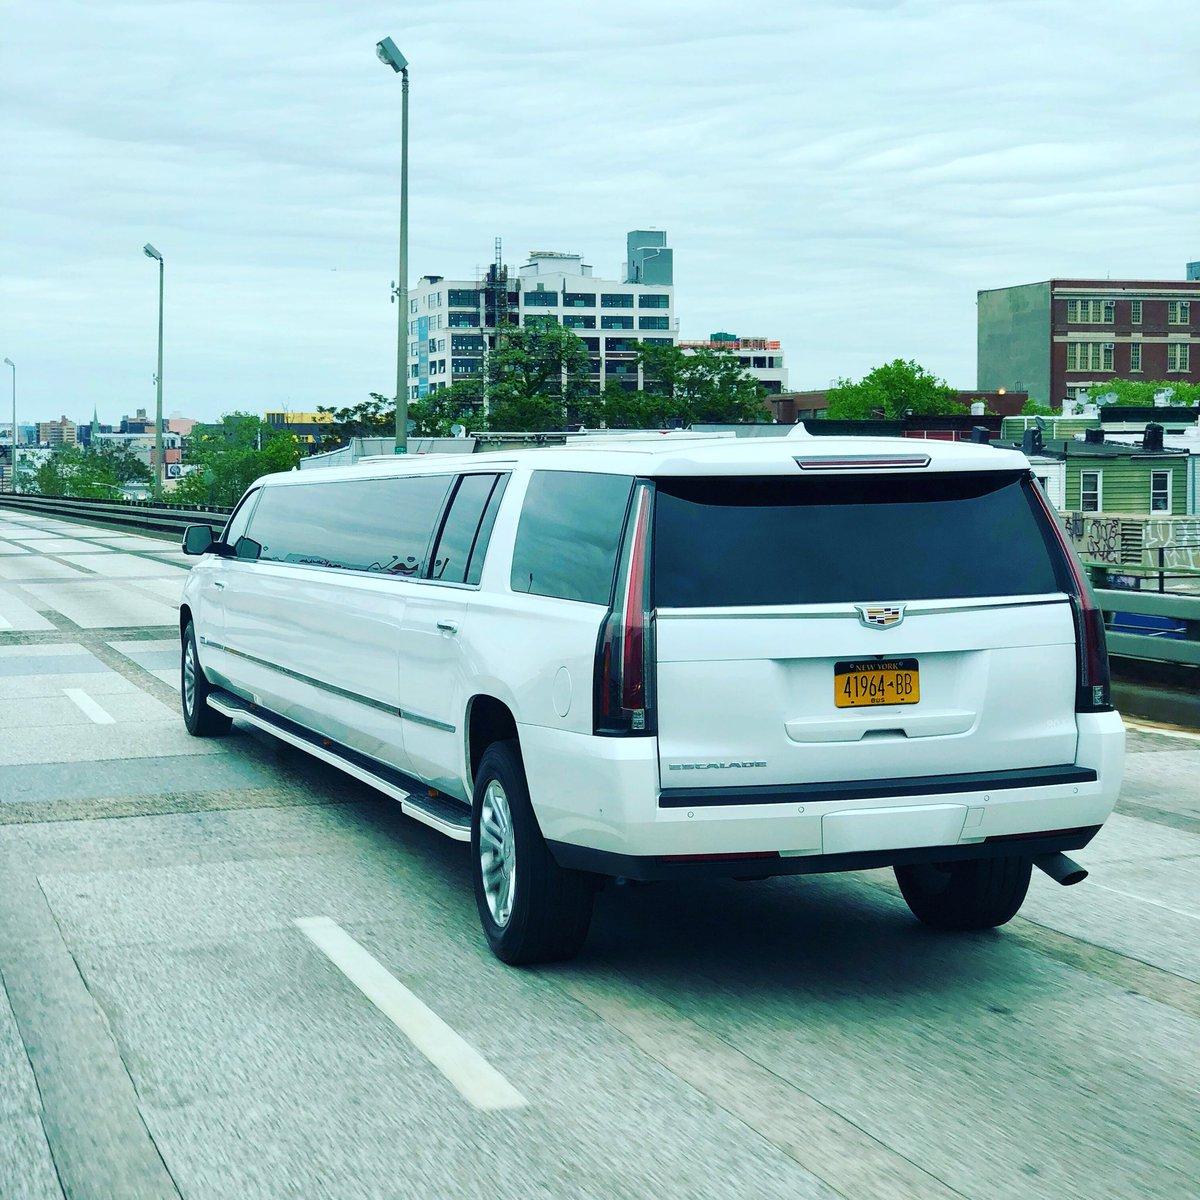 Luxor Limo On Twitter Luxorlimo 2017 Cadillac Escalade